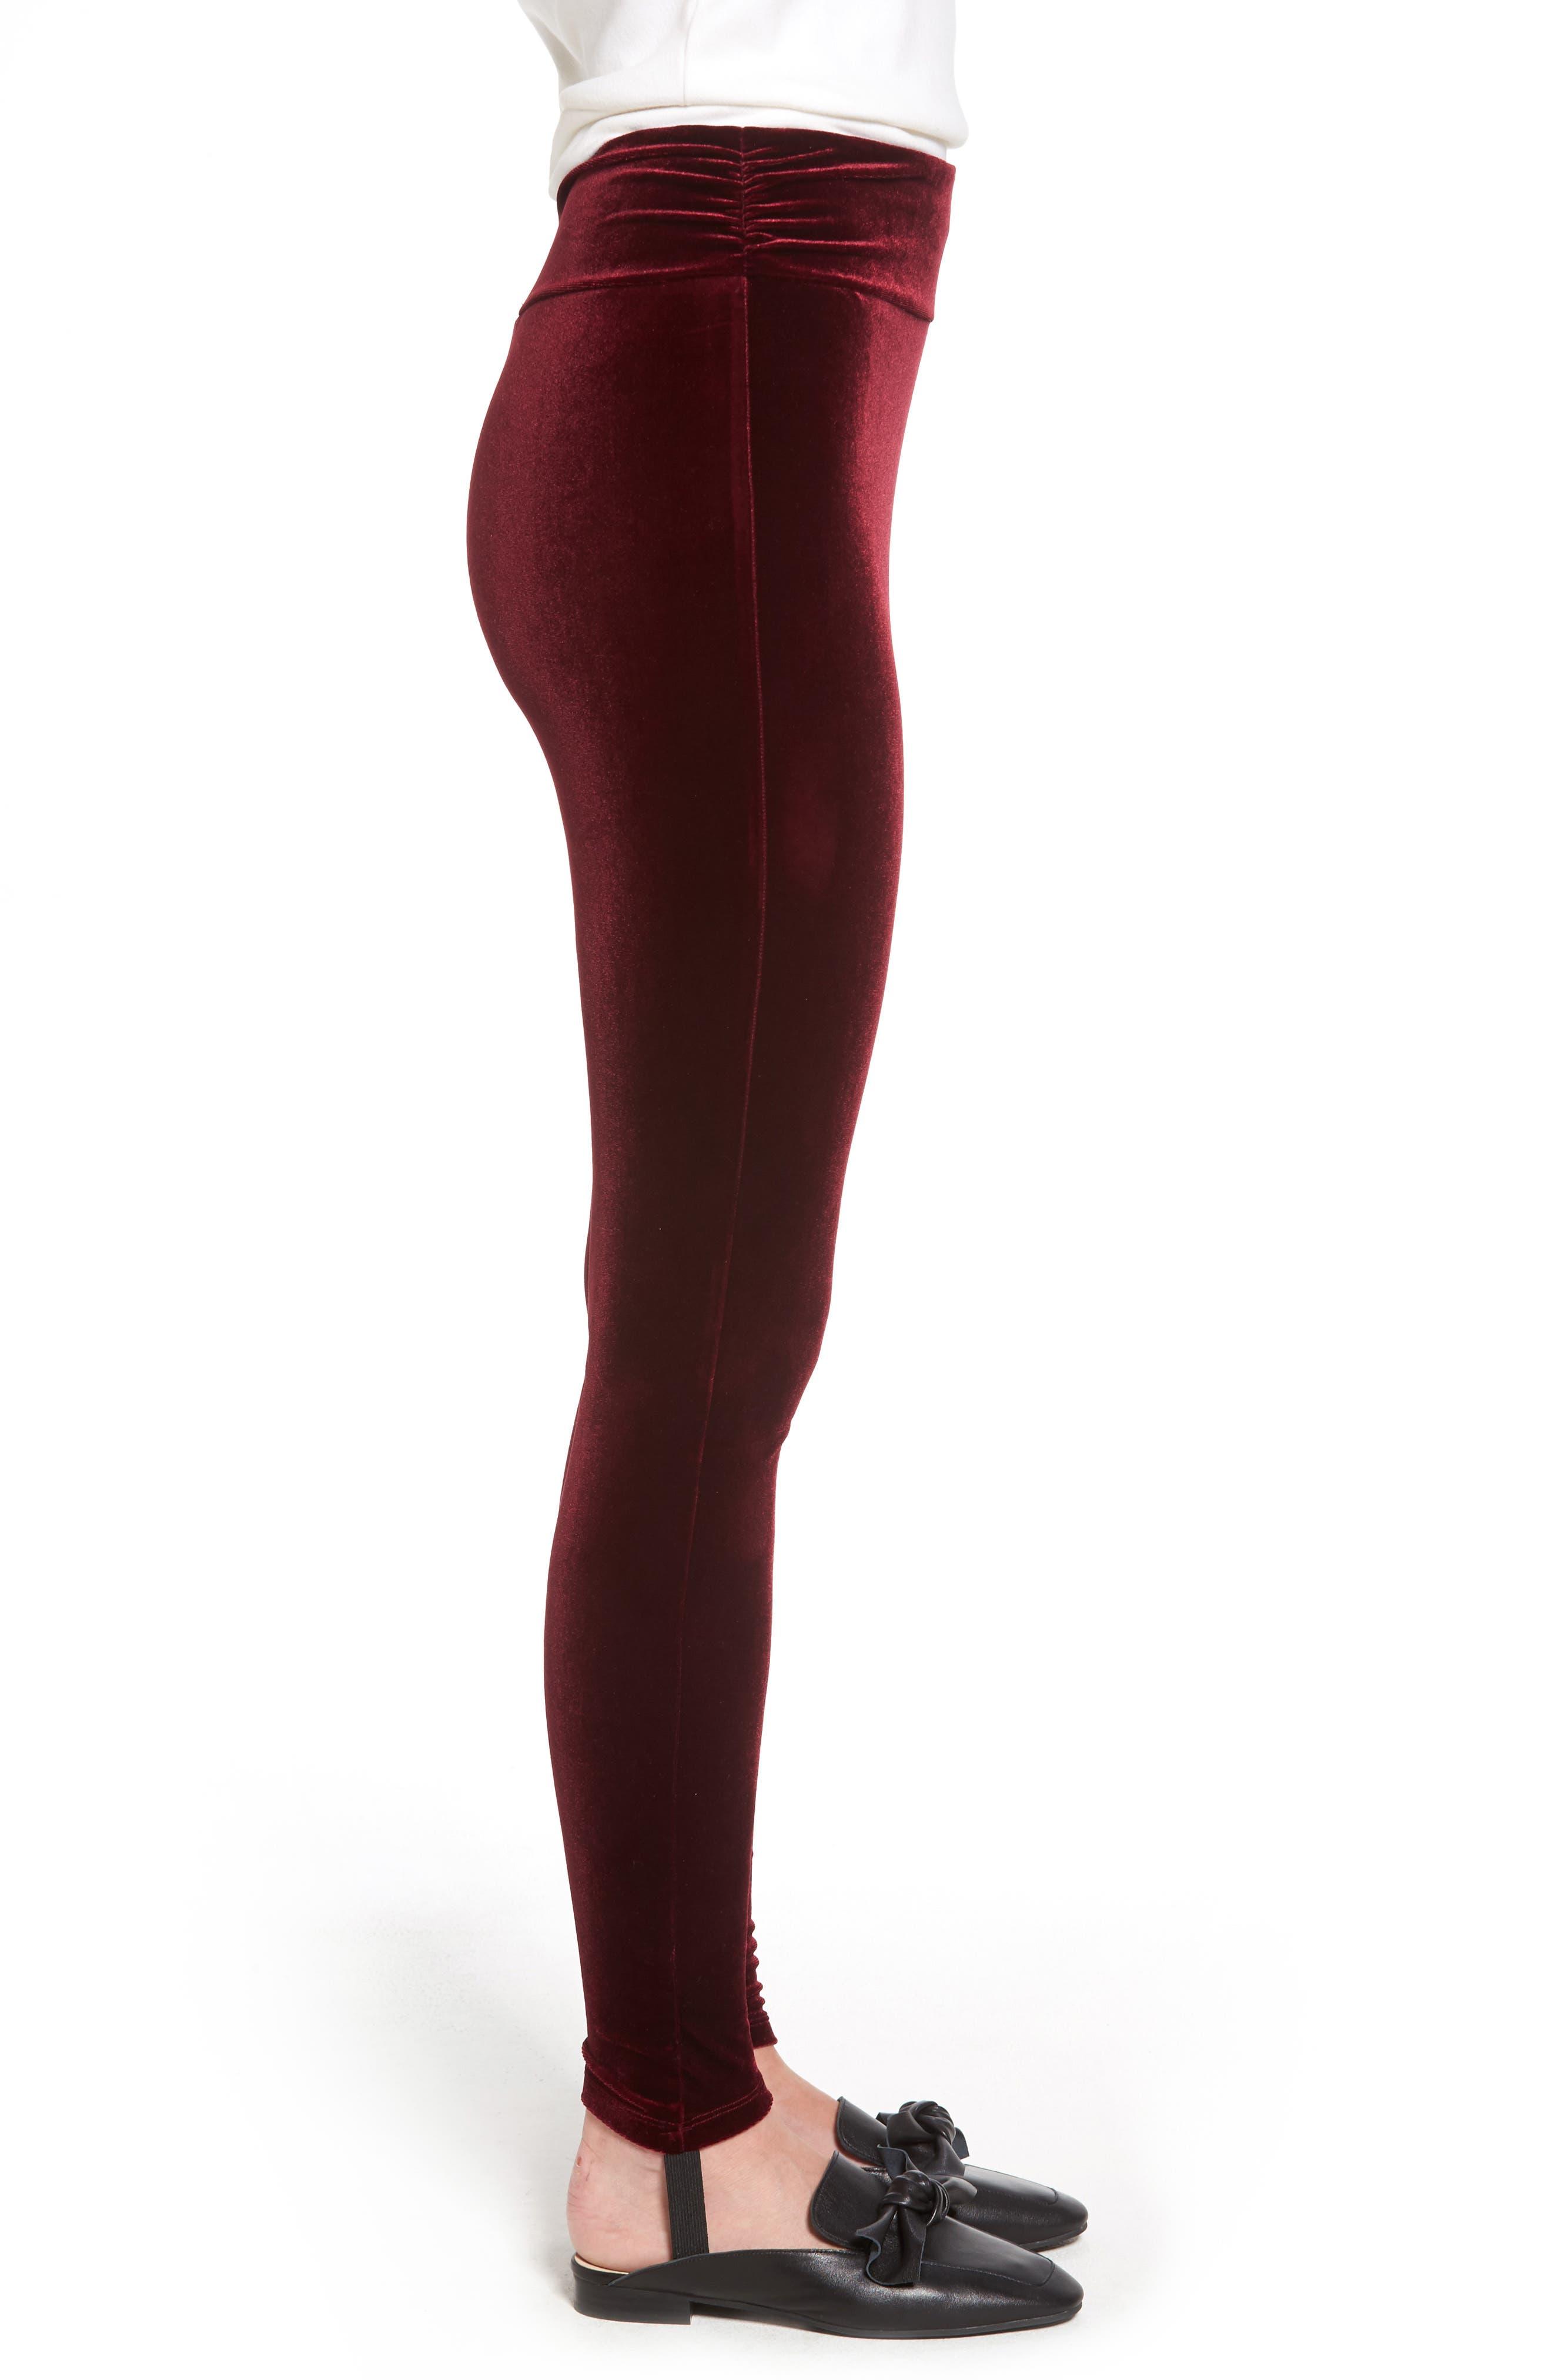 High Waist Velour Stirrup Pants,                             Alternate thumbnail 3, color,                             Red Tannin